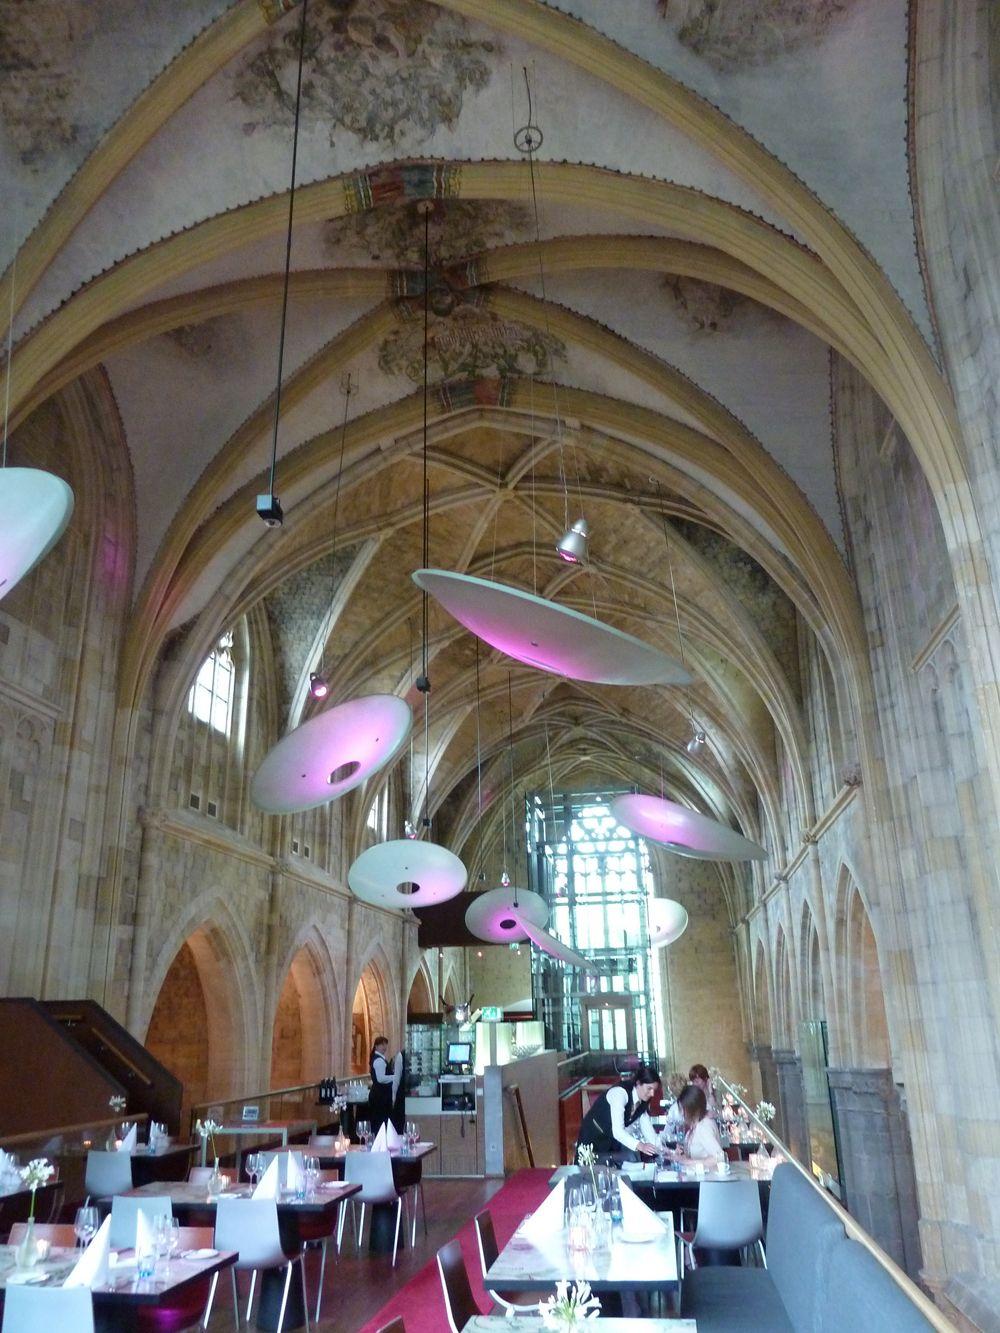 Interieur Kruisherenhotel in Maastricht. Interieur van ...